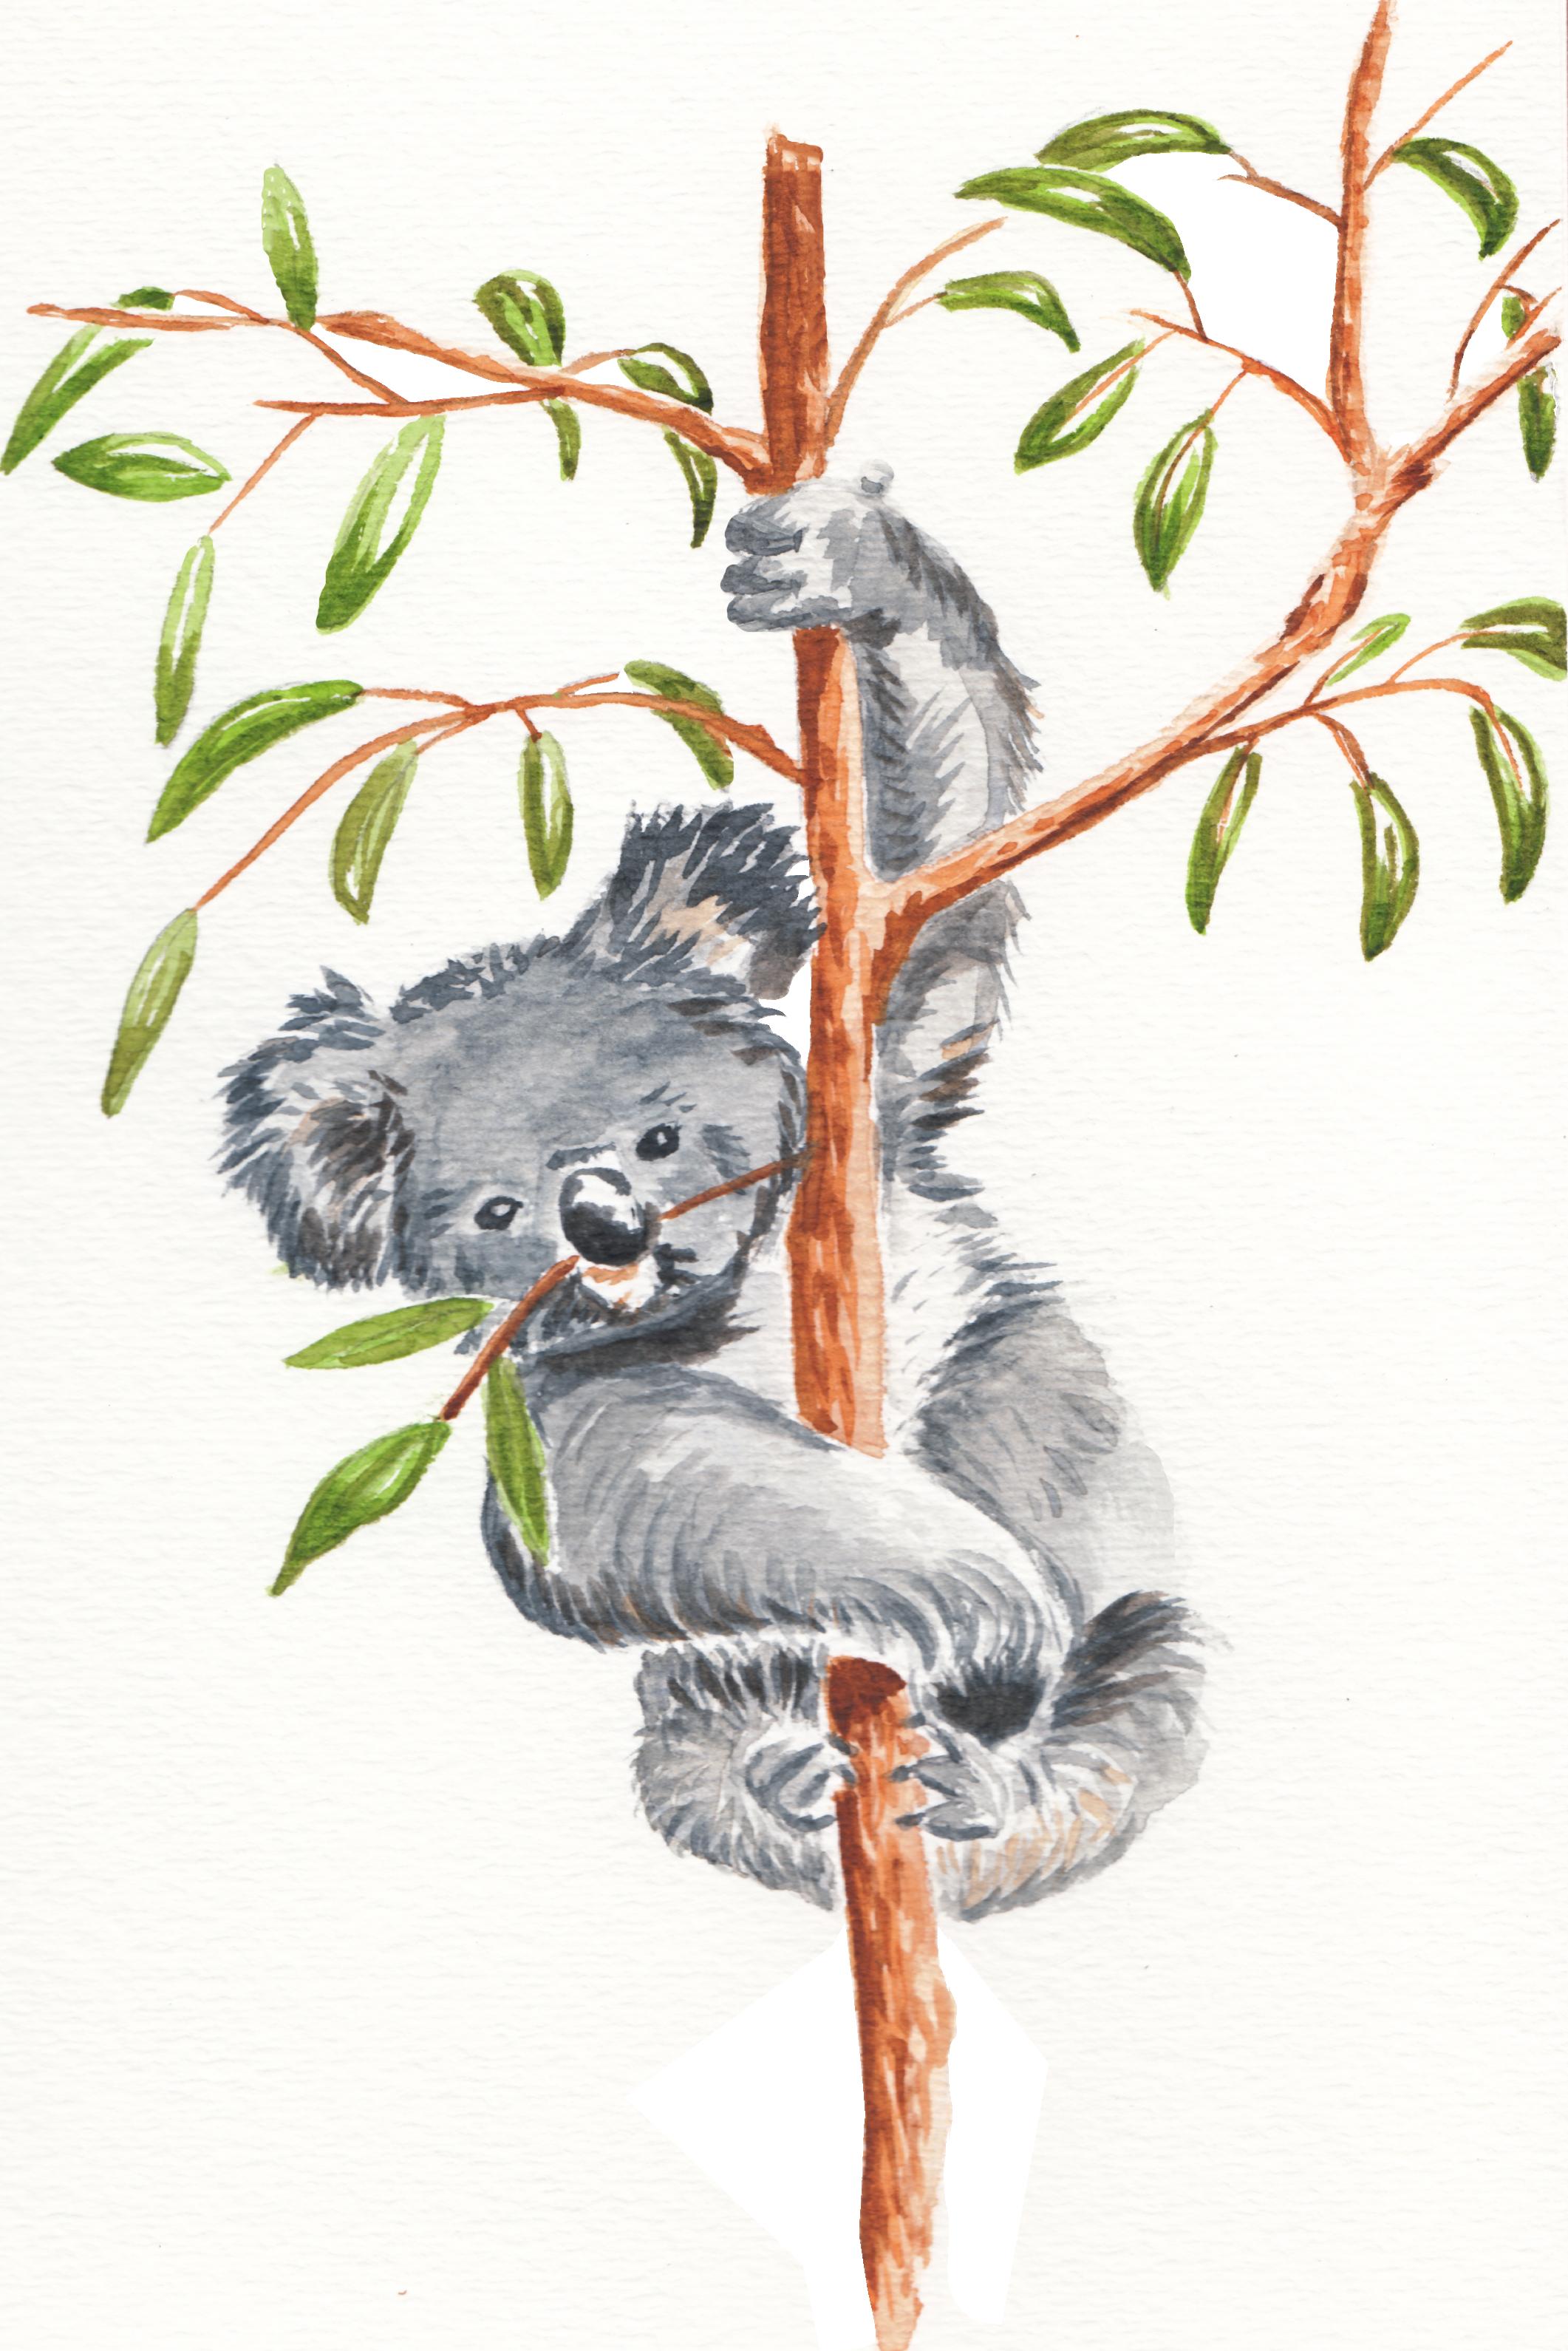 Koala_Painted_Isolated.png